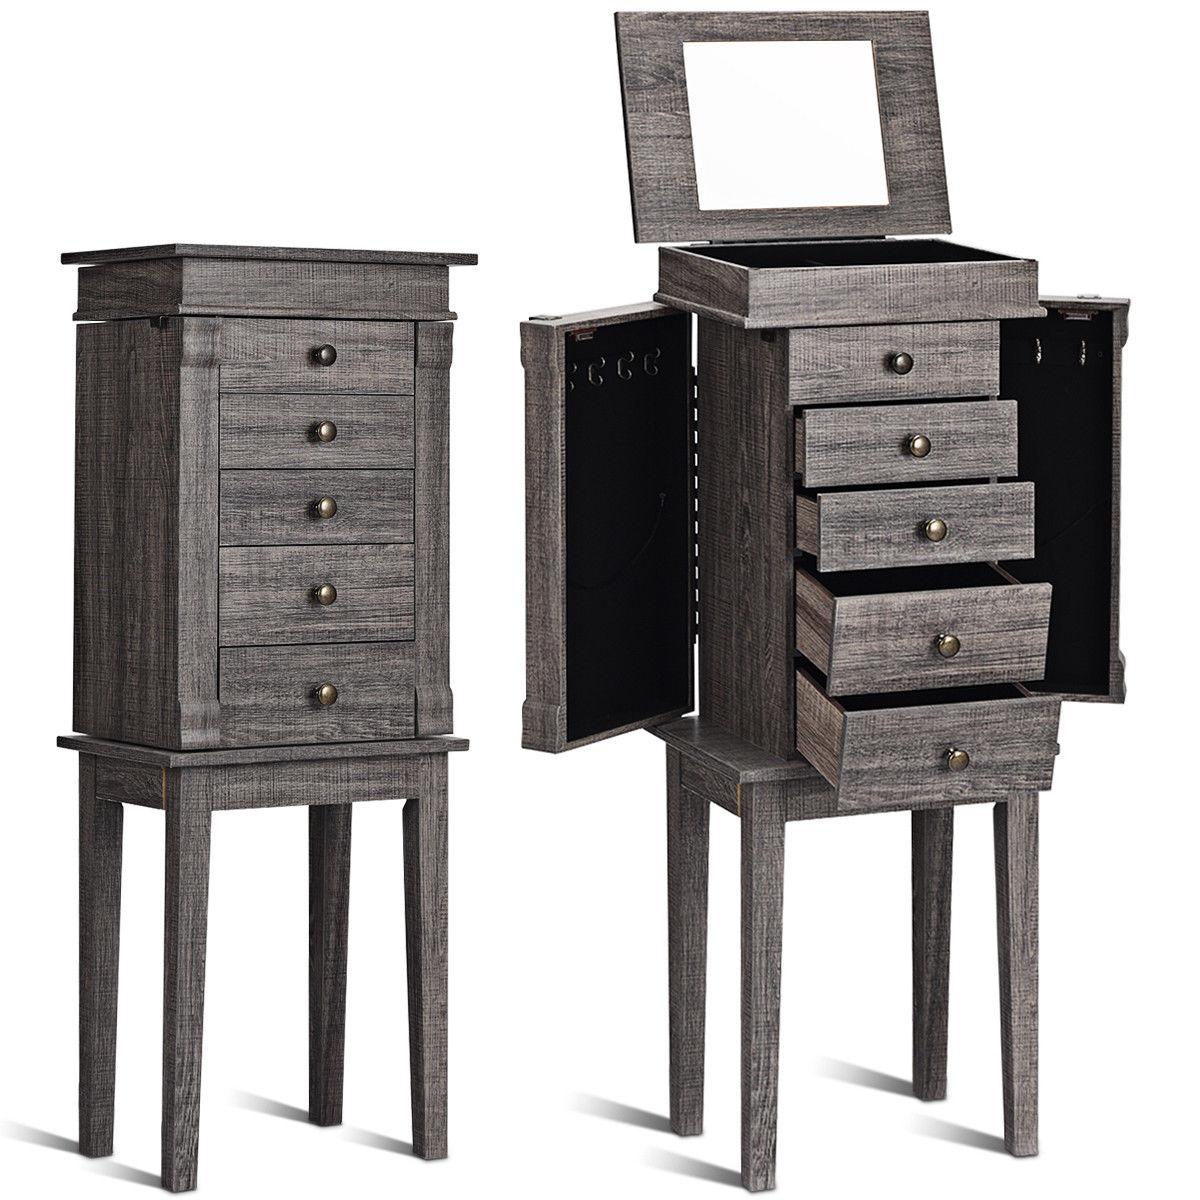 Gymax Standing Jewelry Cabinet Storage Organizer Wood Legs Mirror&5 Drawers Christmas Gift